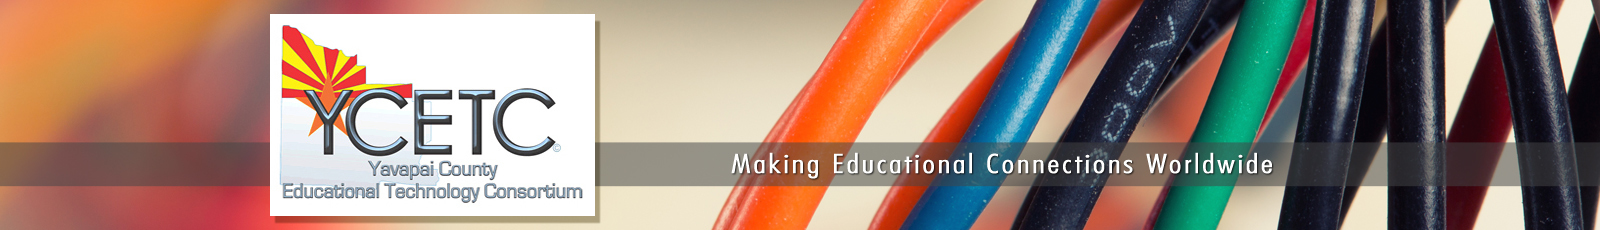 Yavapai County Education Service Agency - YCETC